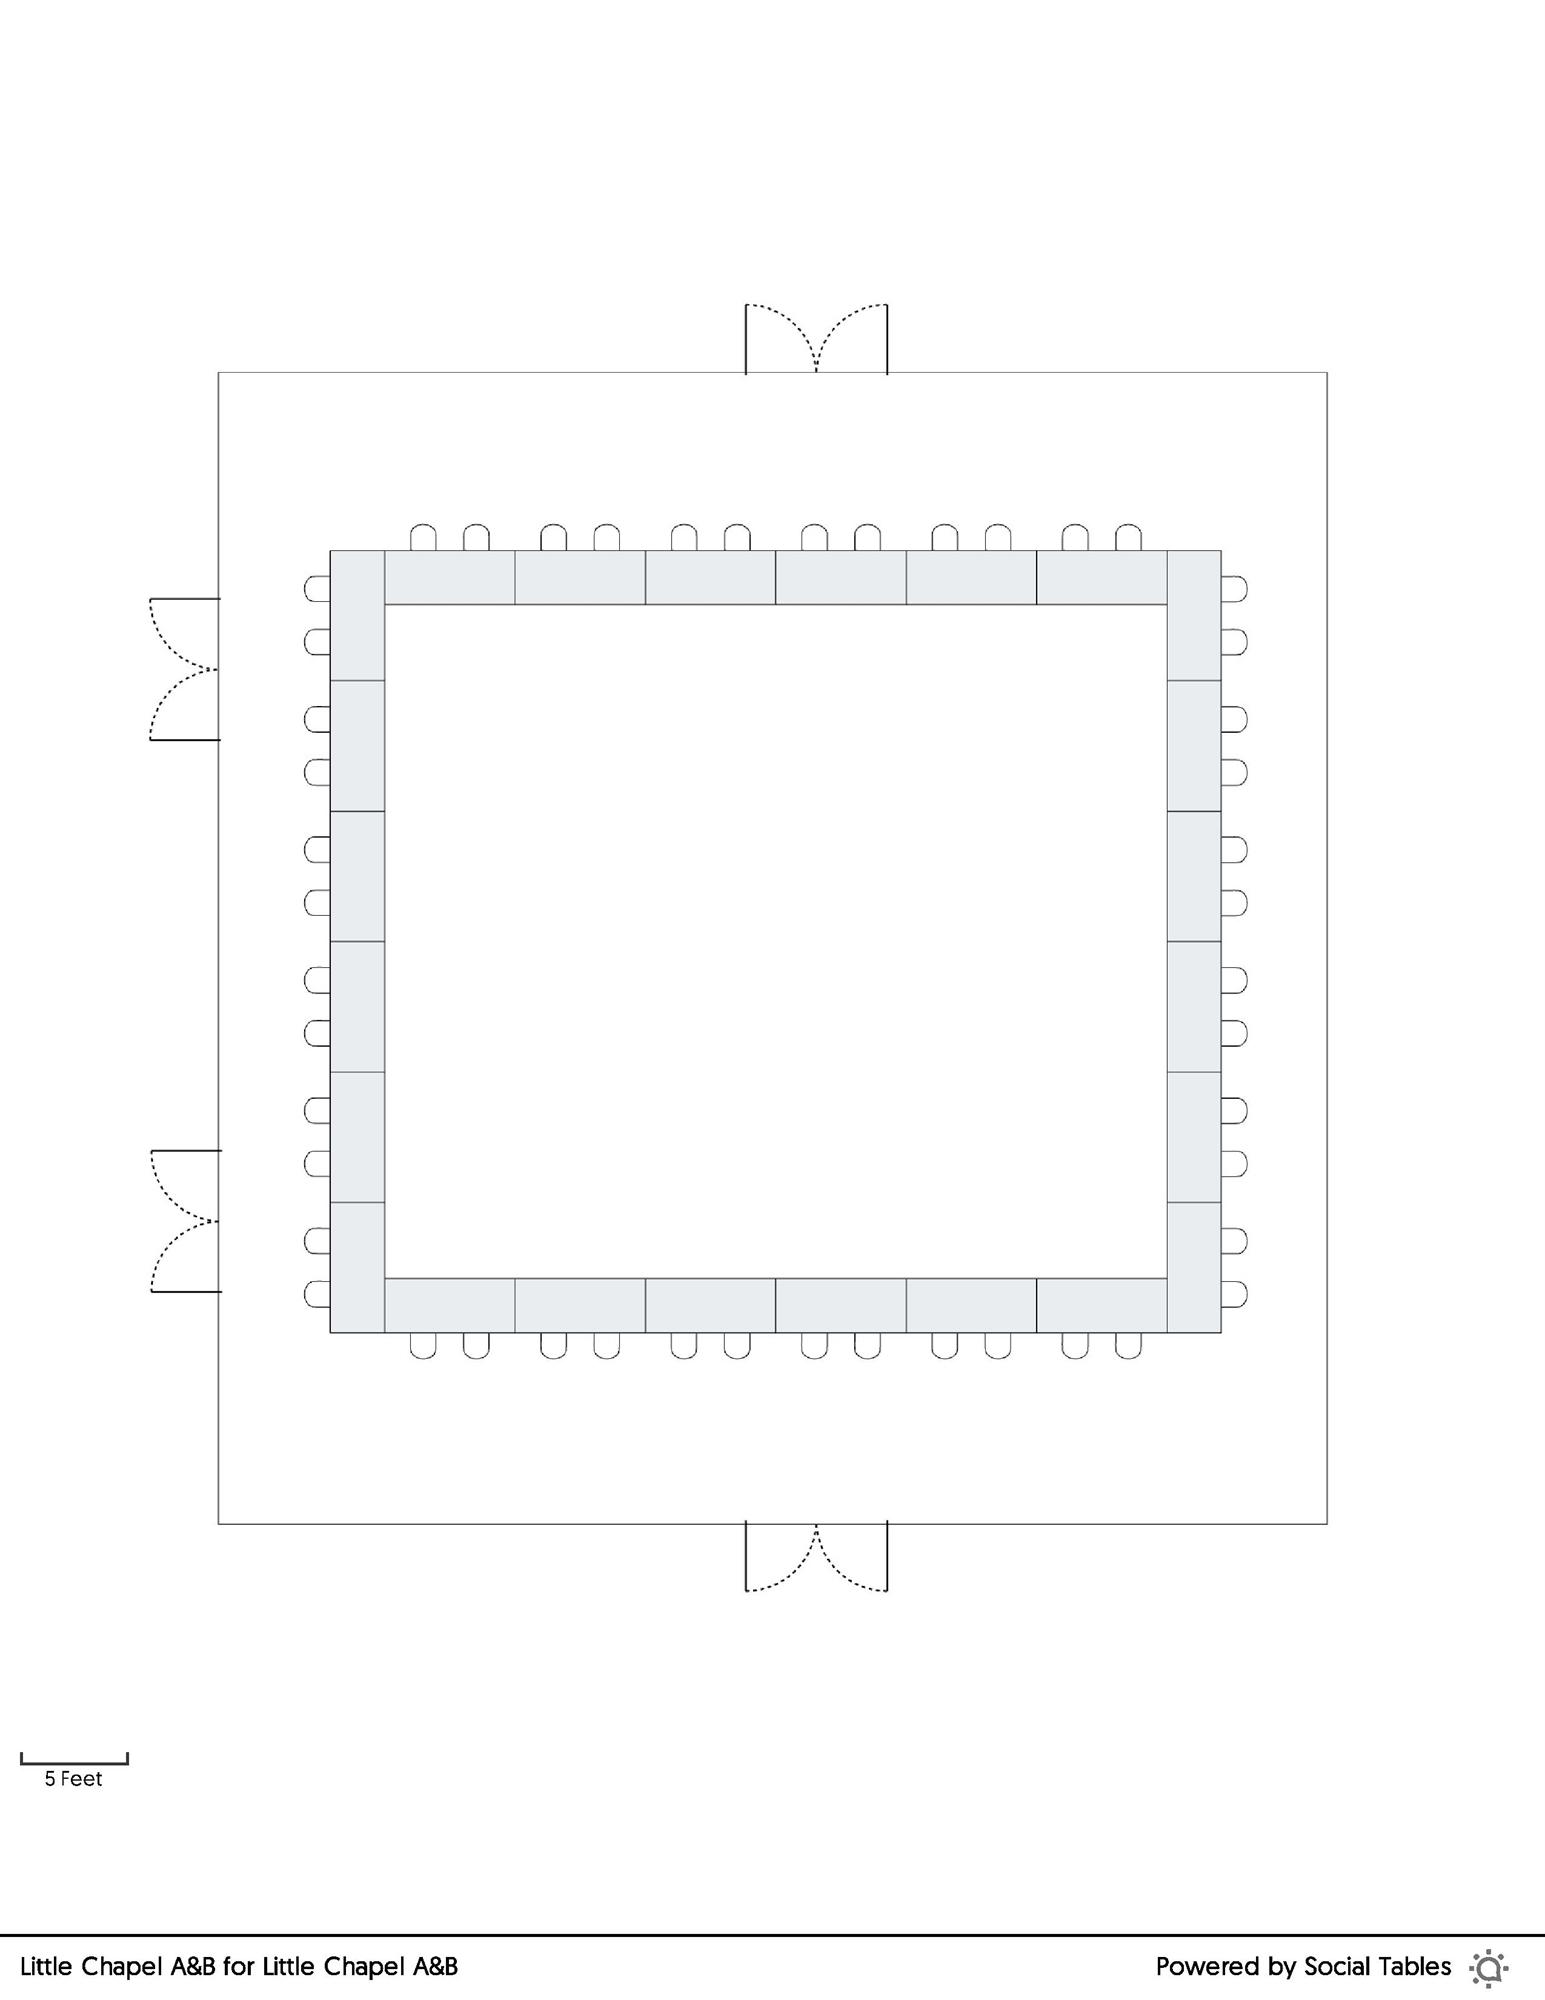 Little Chapel A&B Hollow Square floorplan